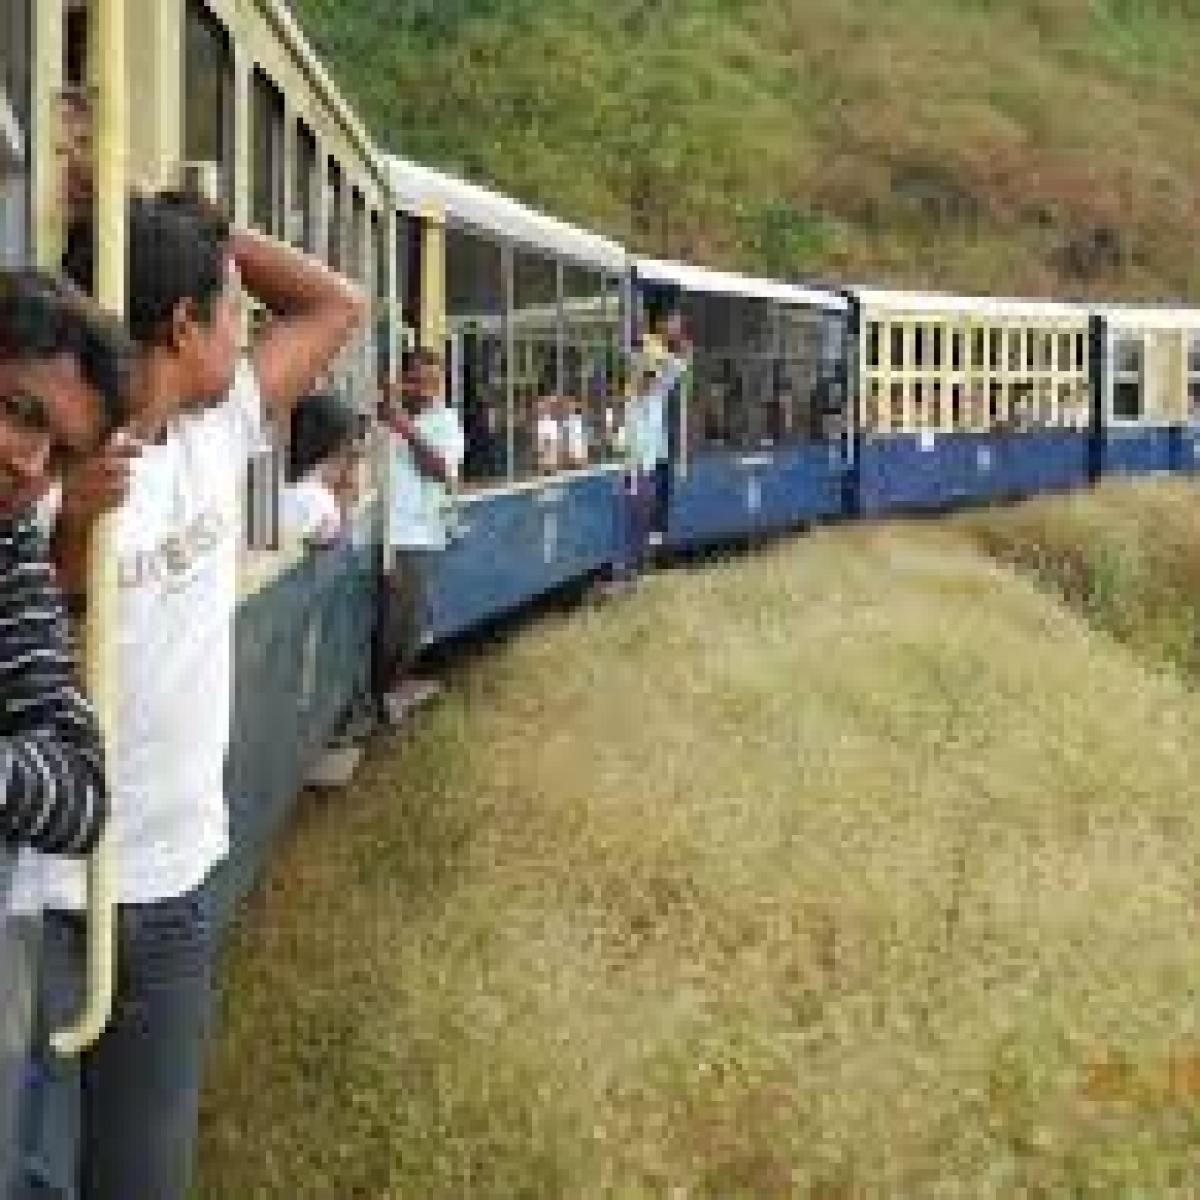 Maharashtra: Matheran toy train to get back on track on Friday